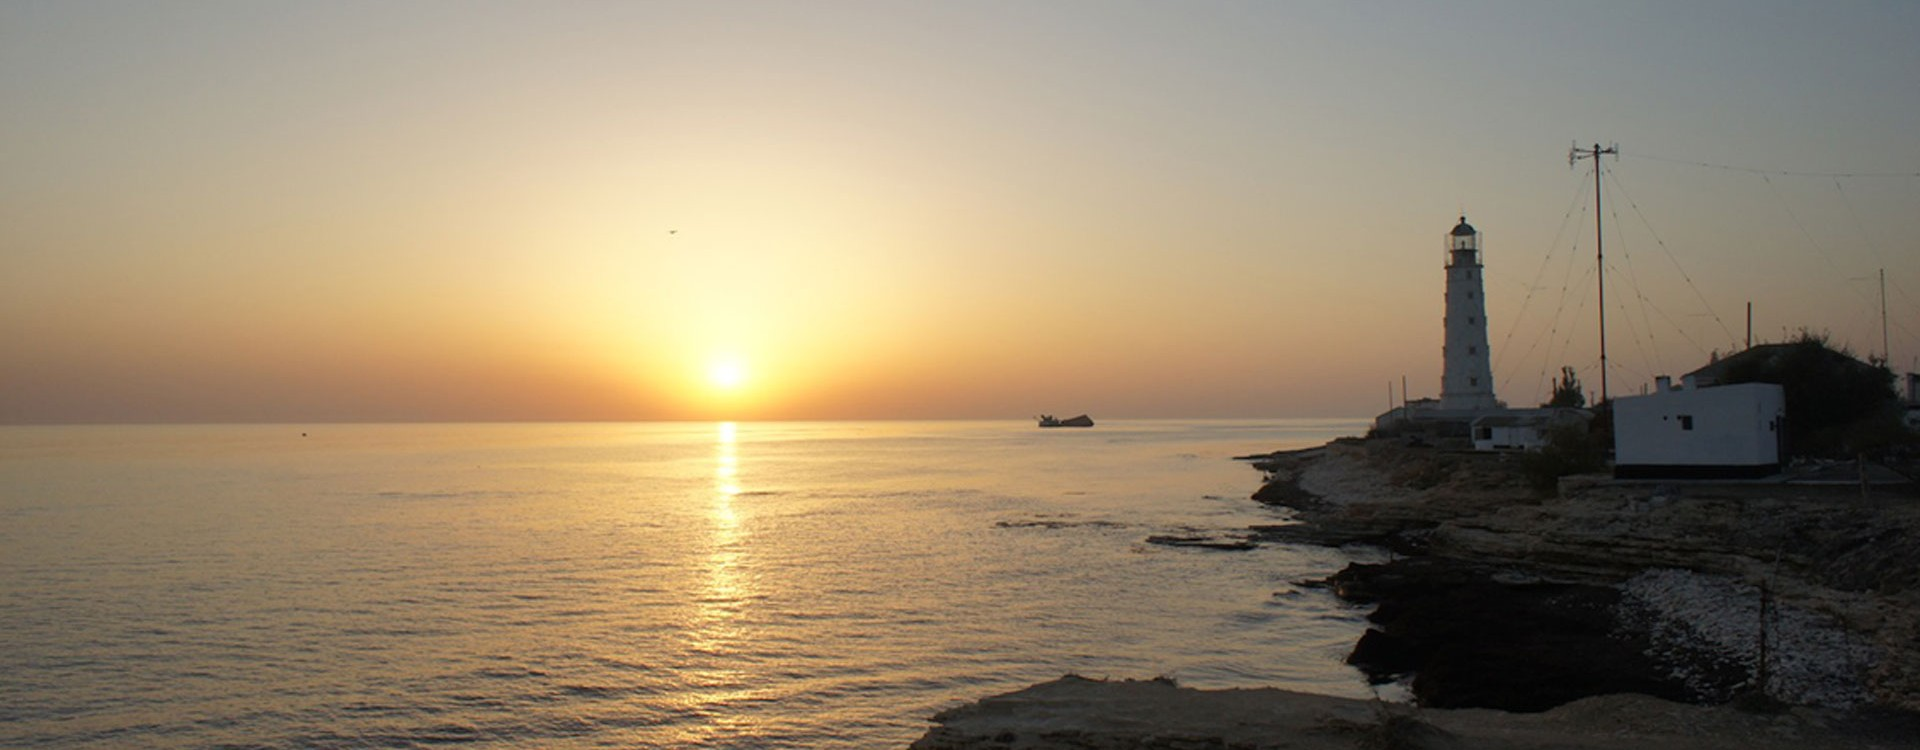 Маяк на закате солнца в оленевке